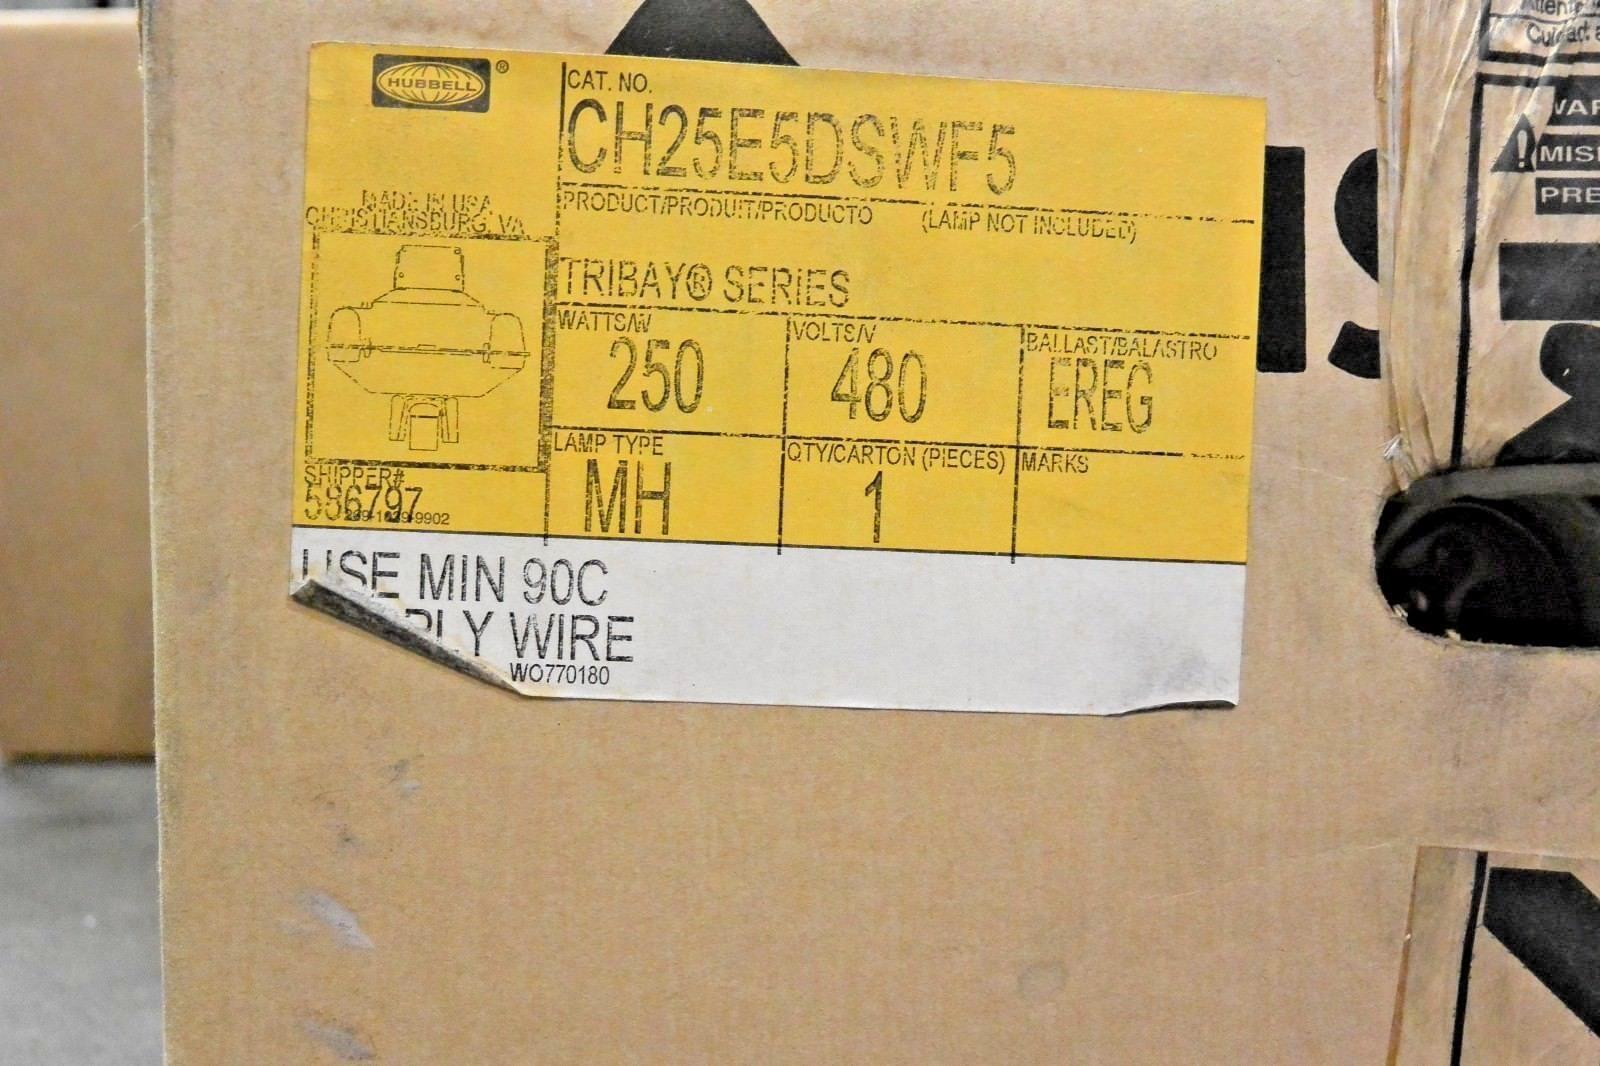 Hubbell CH25E5DSWF5 250W 480V Metal Halide Light Fixture